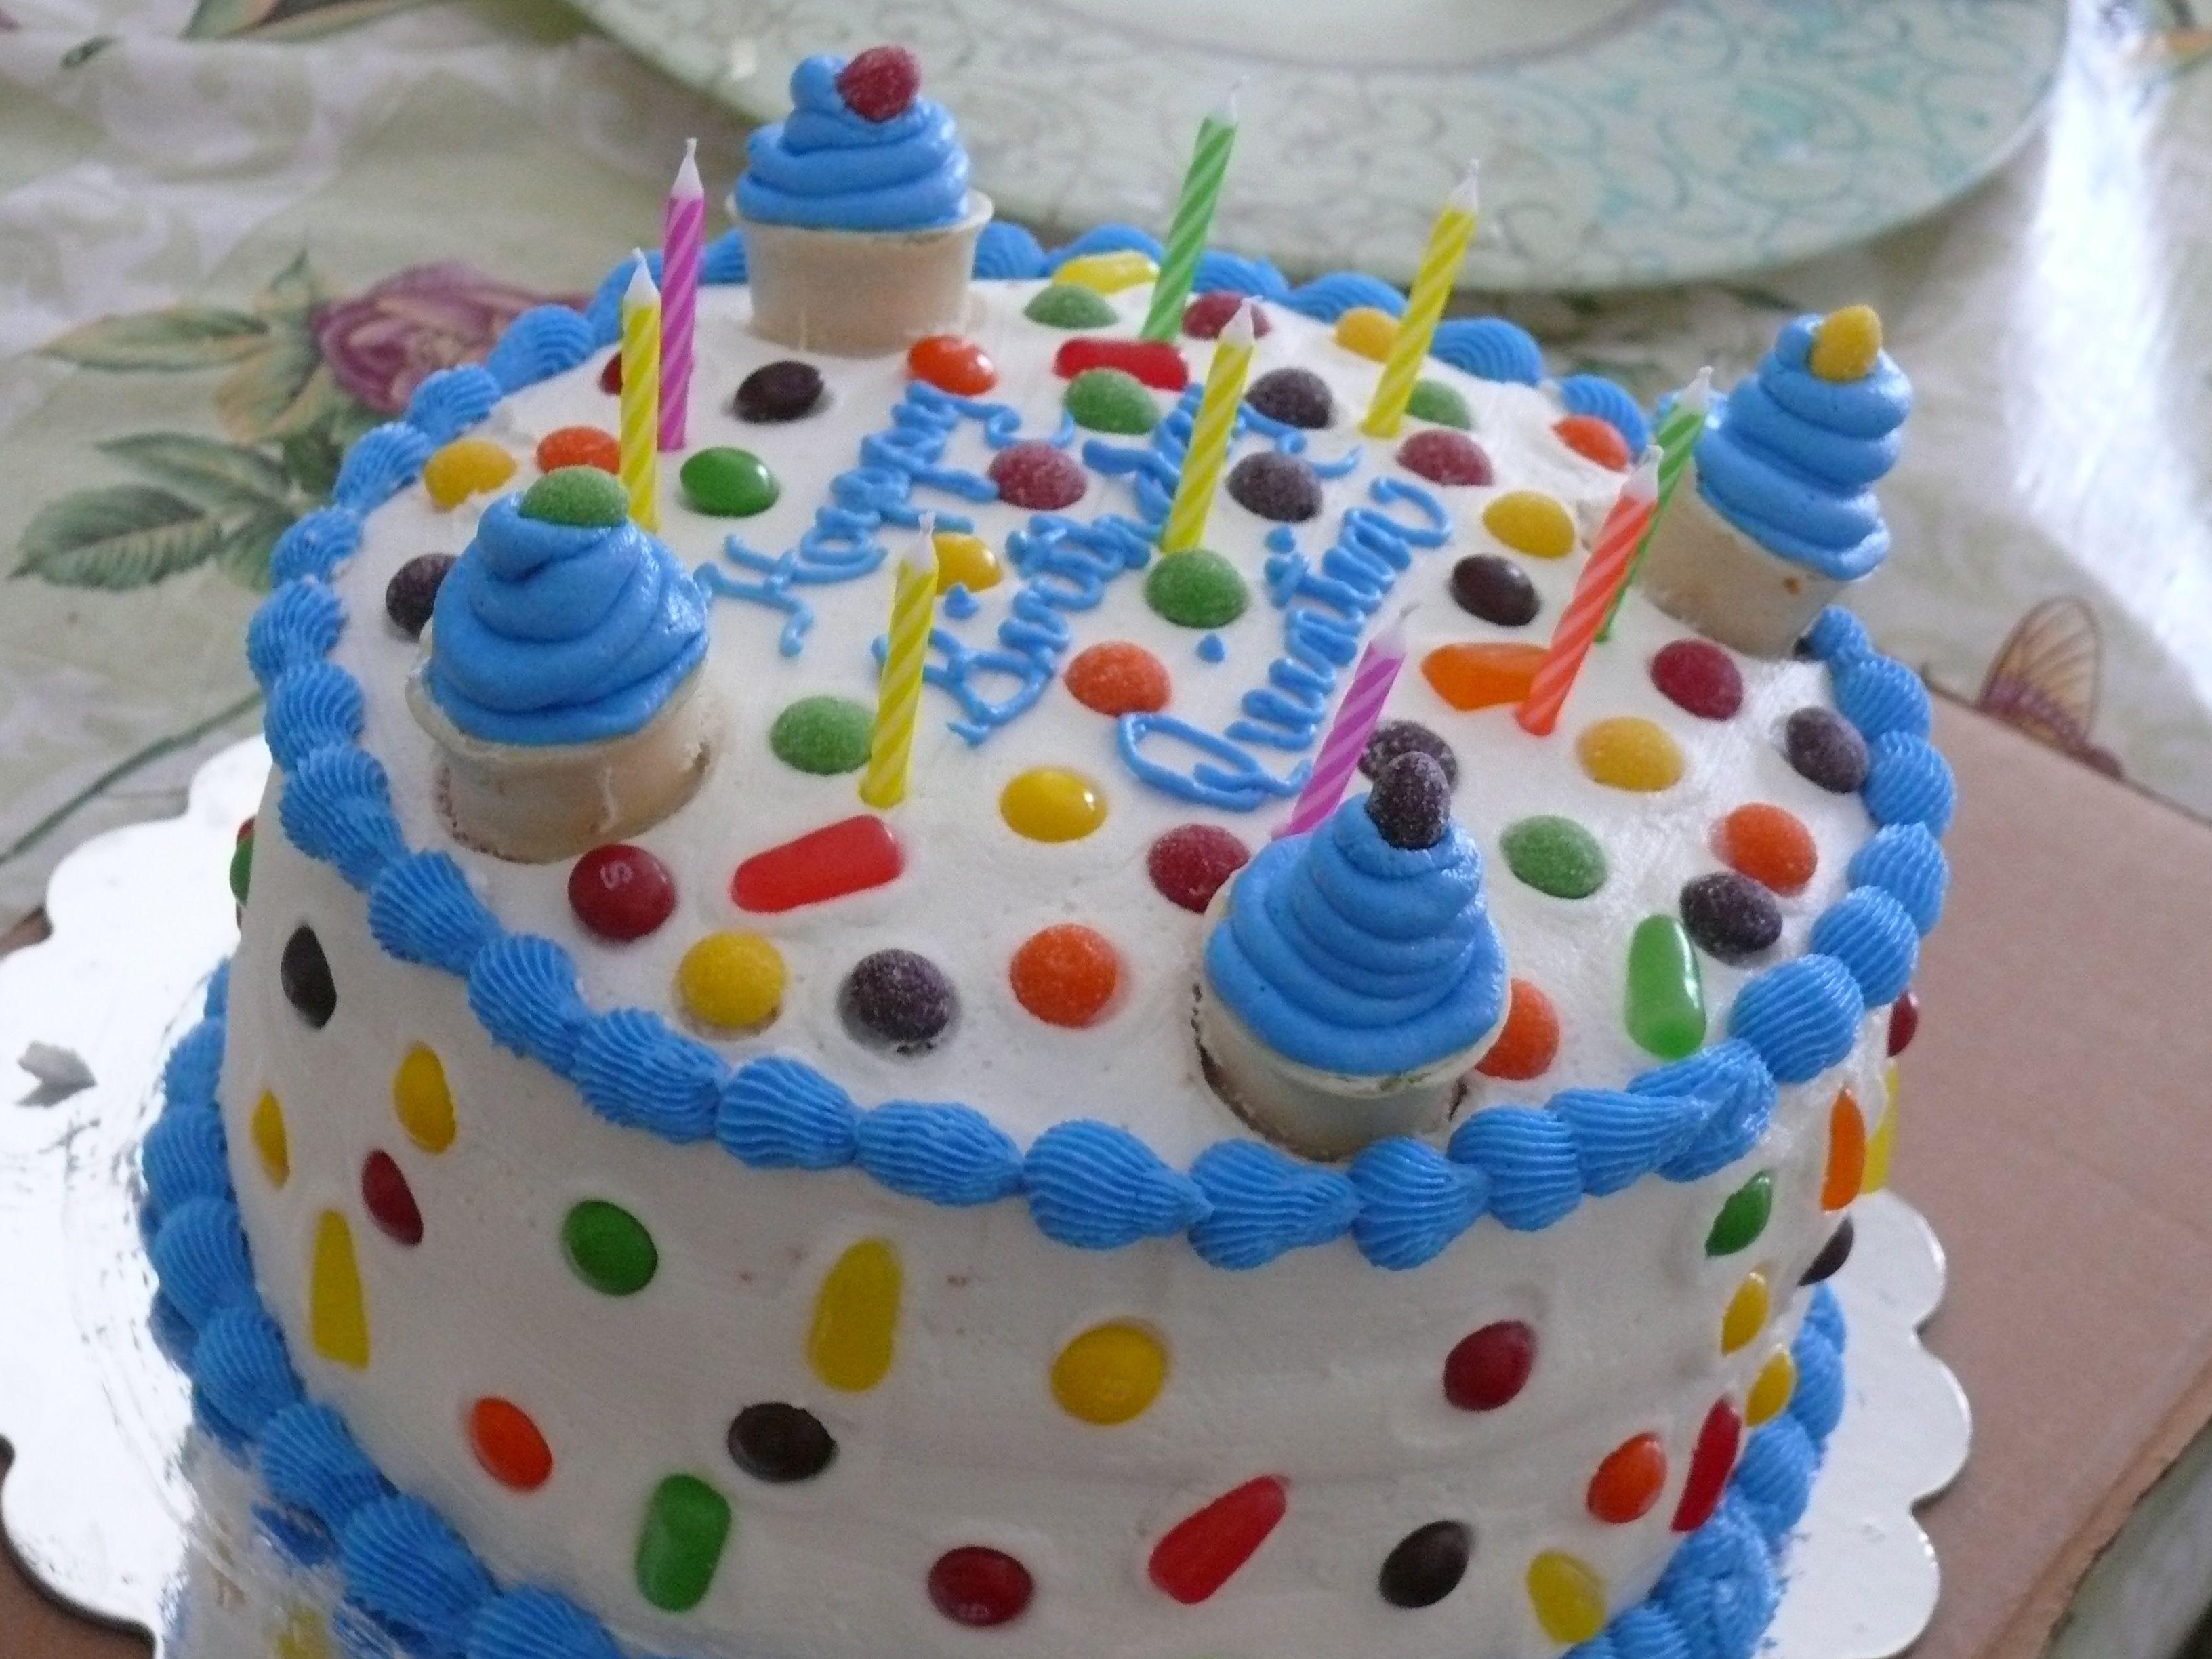 Sensational Strawberry Cake Buttercream Icing Homemade Birthday Cakes Kids Funny Birthday Cards Online Benoljebrpdamsfinfo